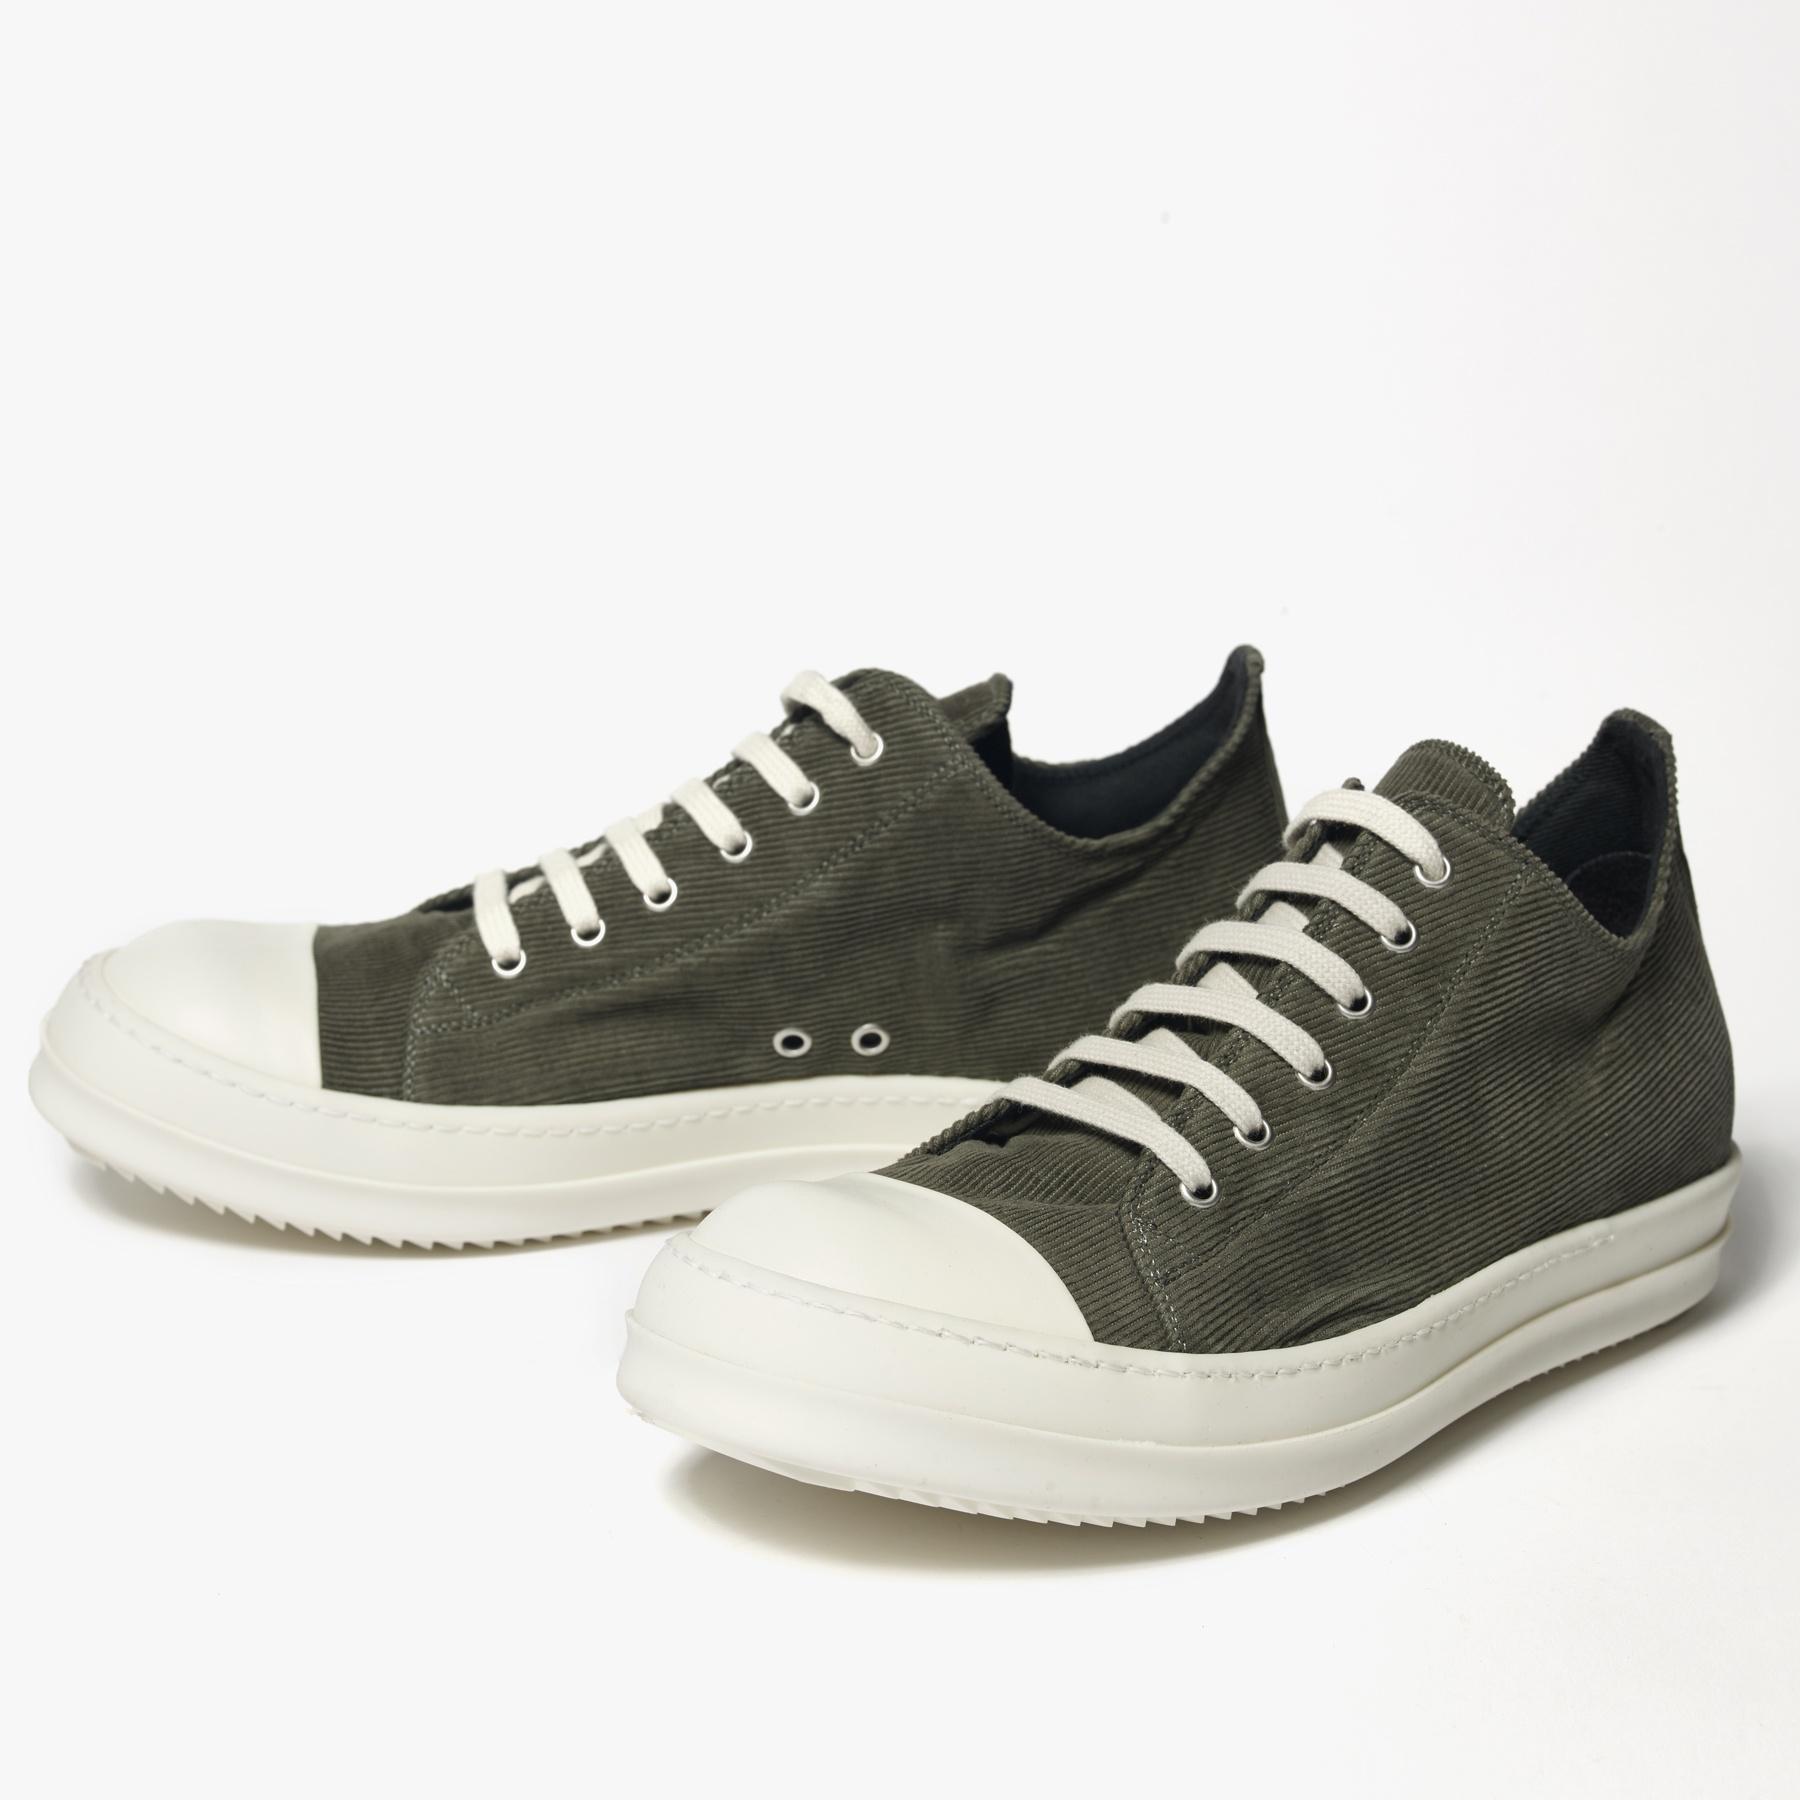 c305cd67d59 Lyst - James Perse Drkshdw Low-top Sneakers - Mens in Green for Men